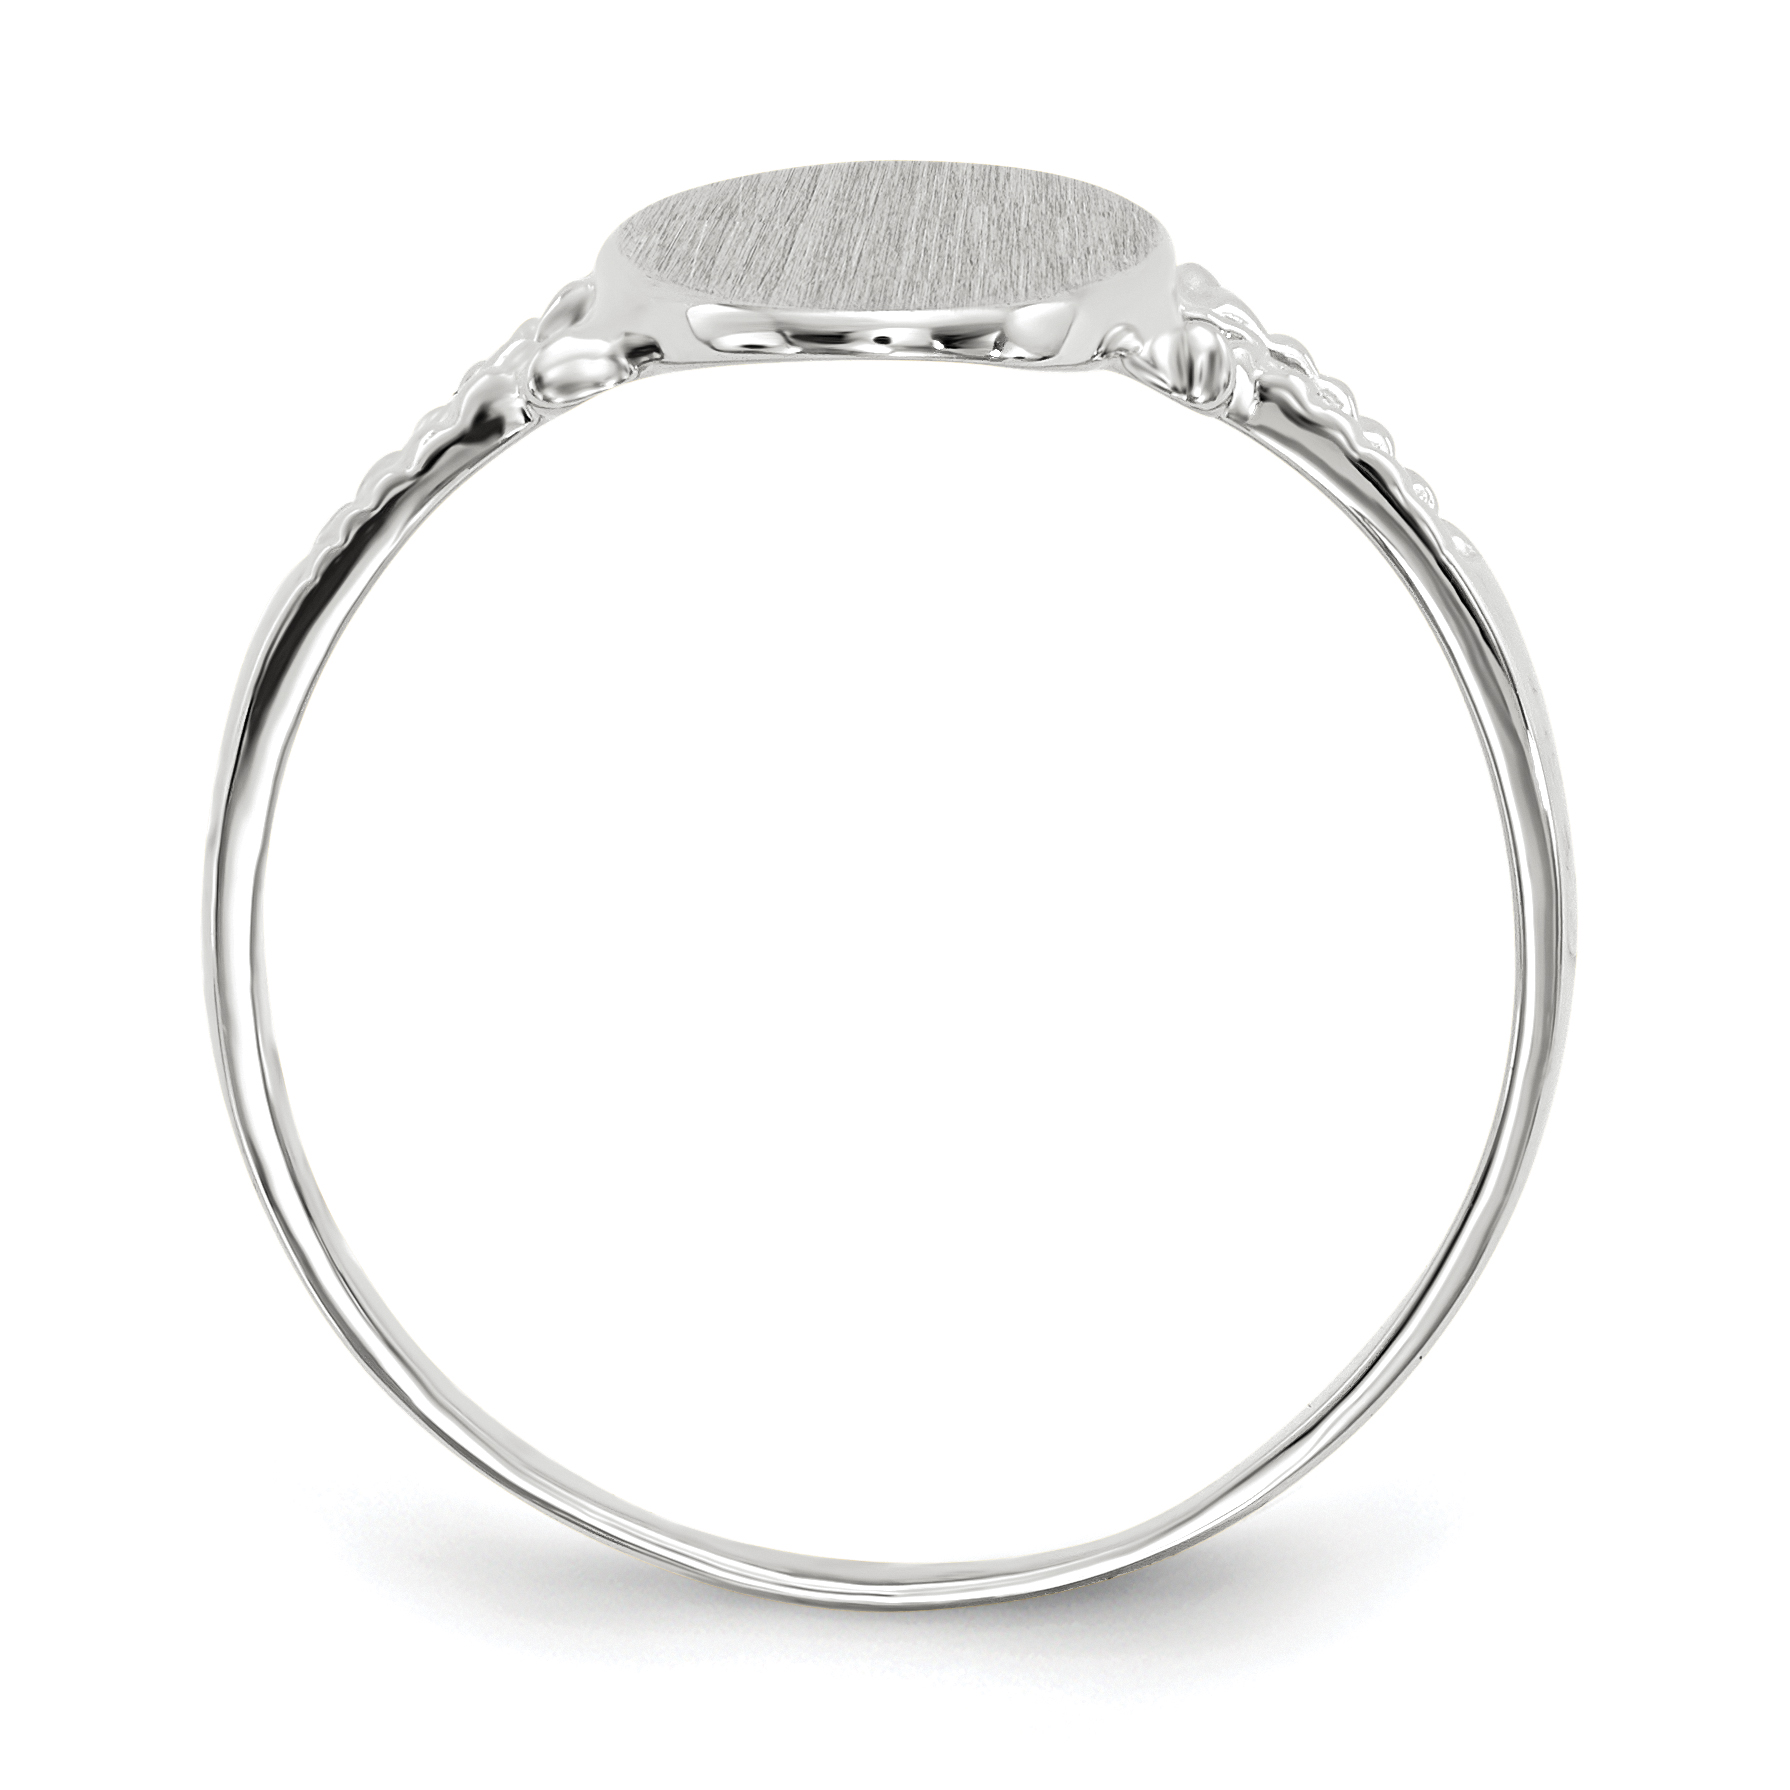 14K White Gold Signet Ring - image 3 of 5